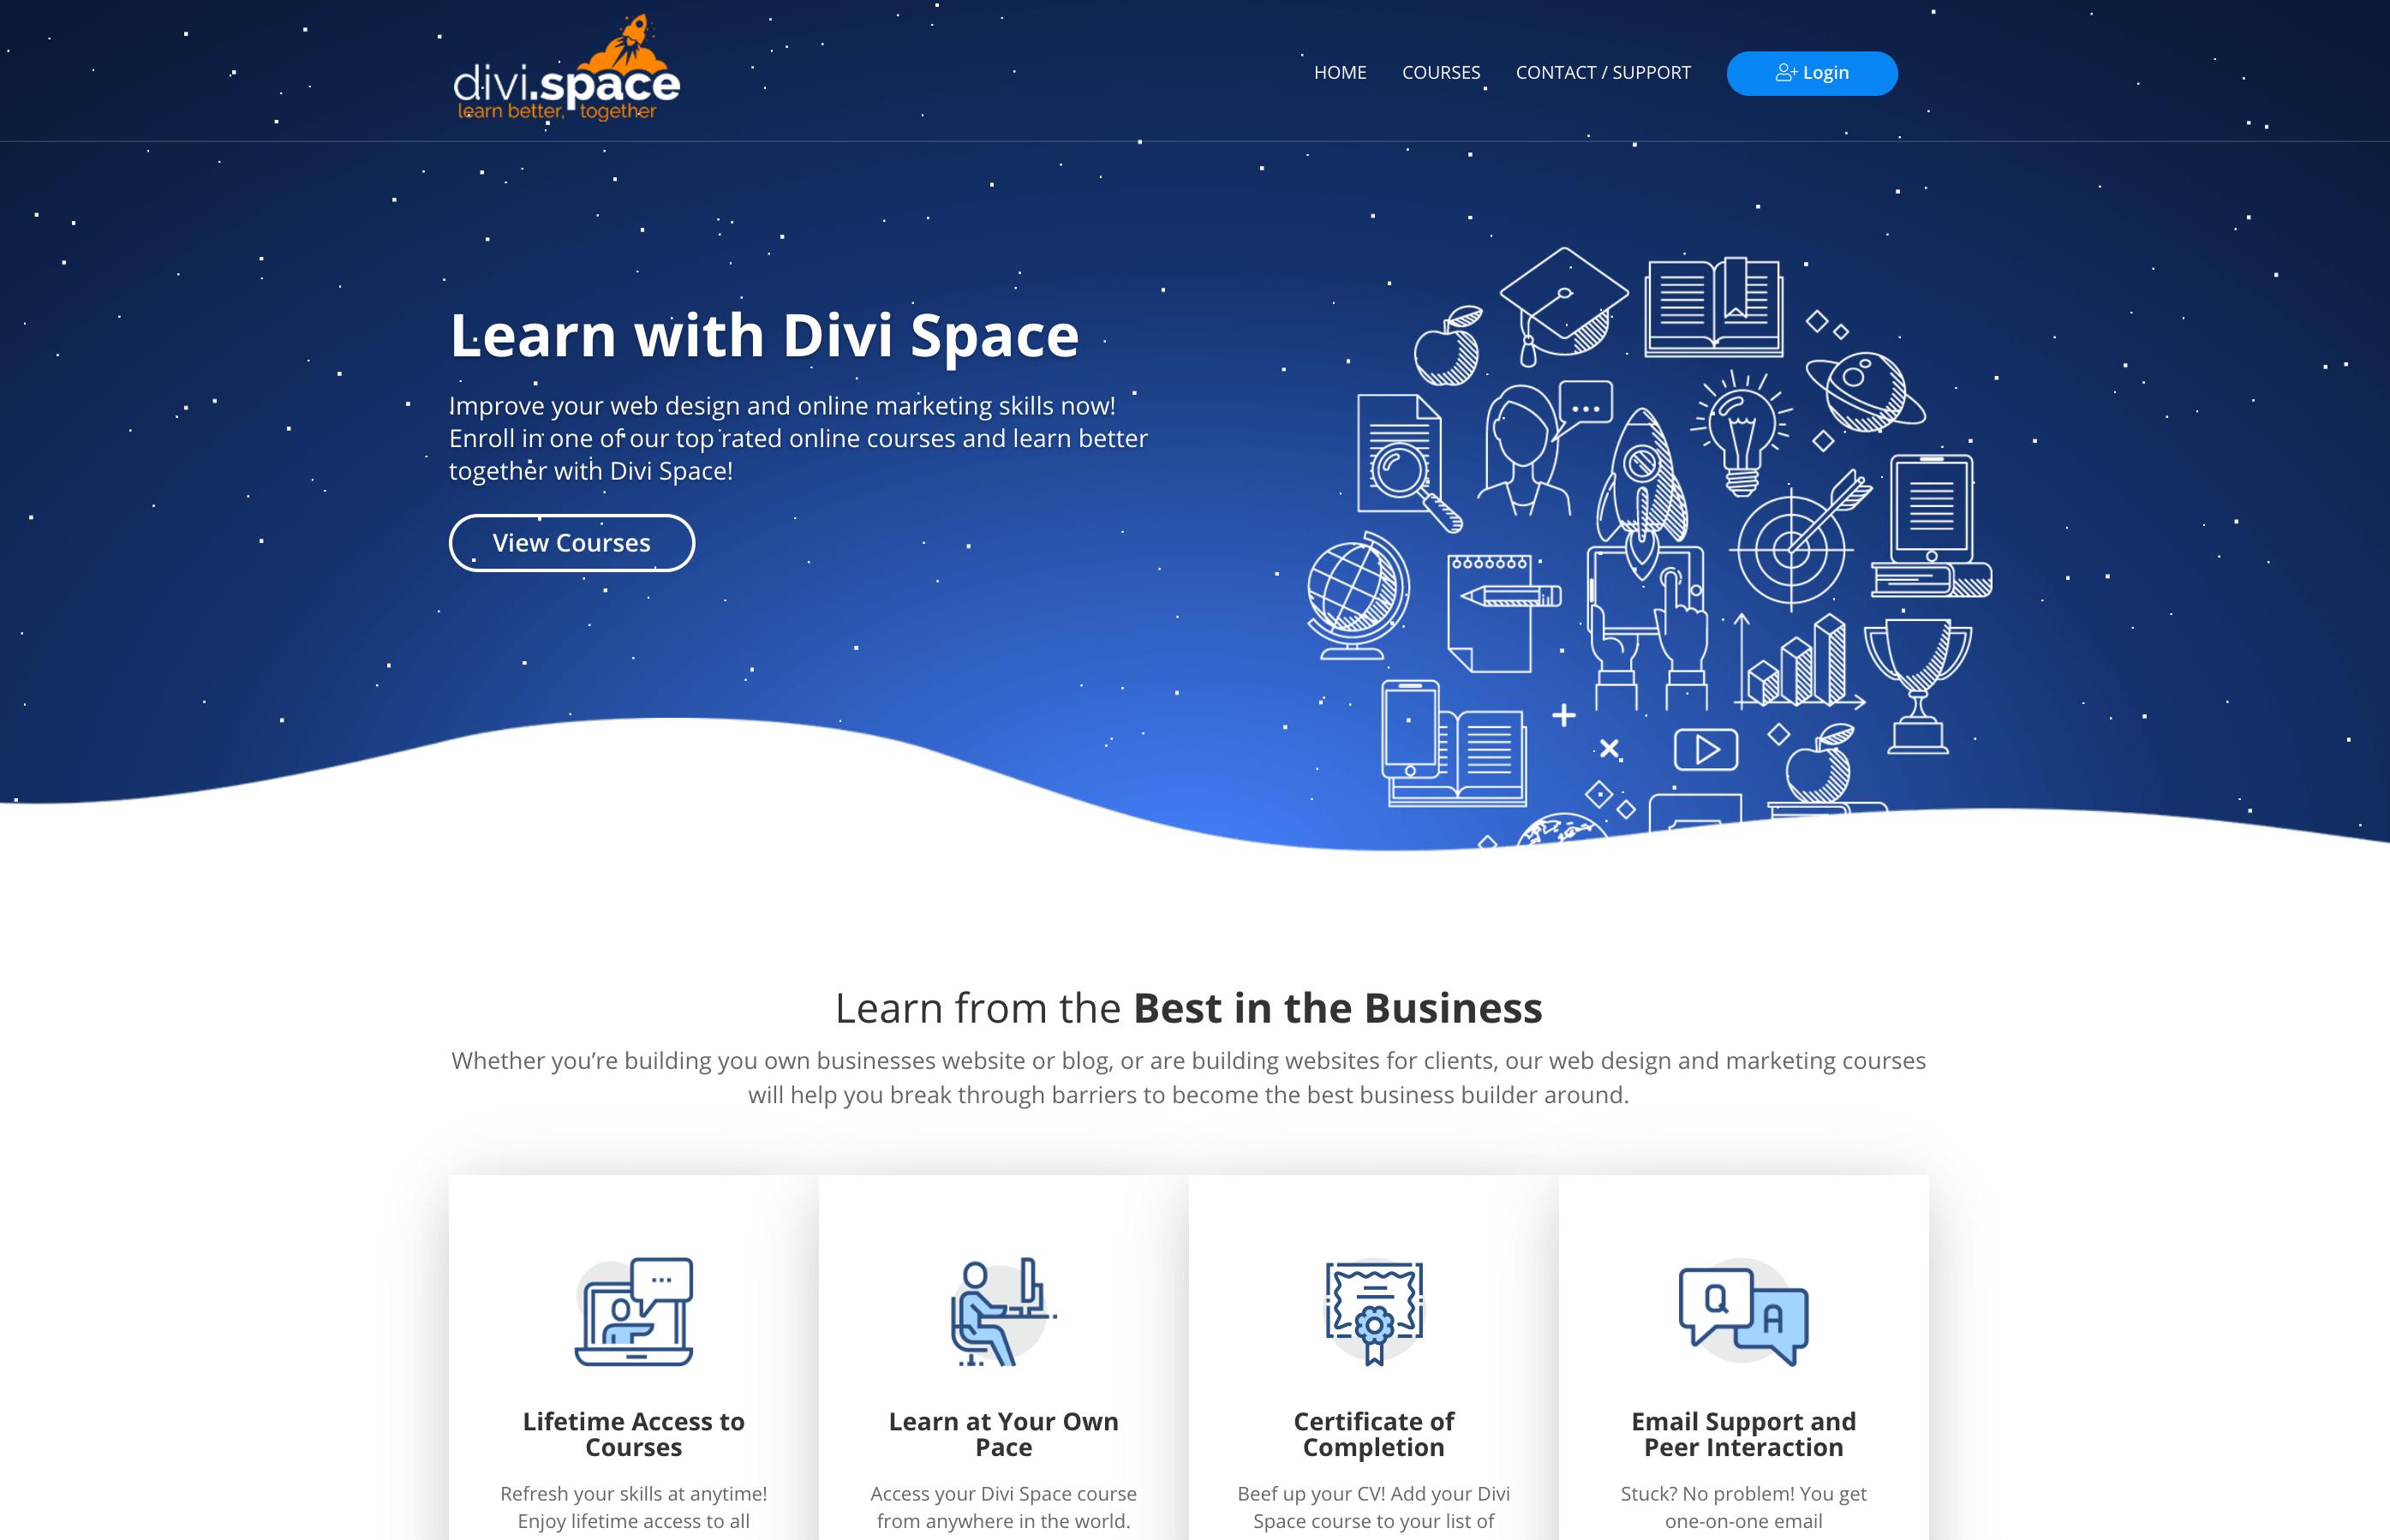 Premium_Divi_Courses___Learn_Divi___Divi_Course_Resource (1)